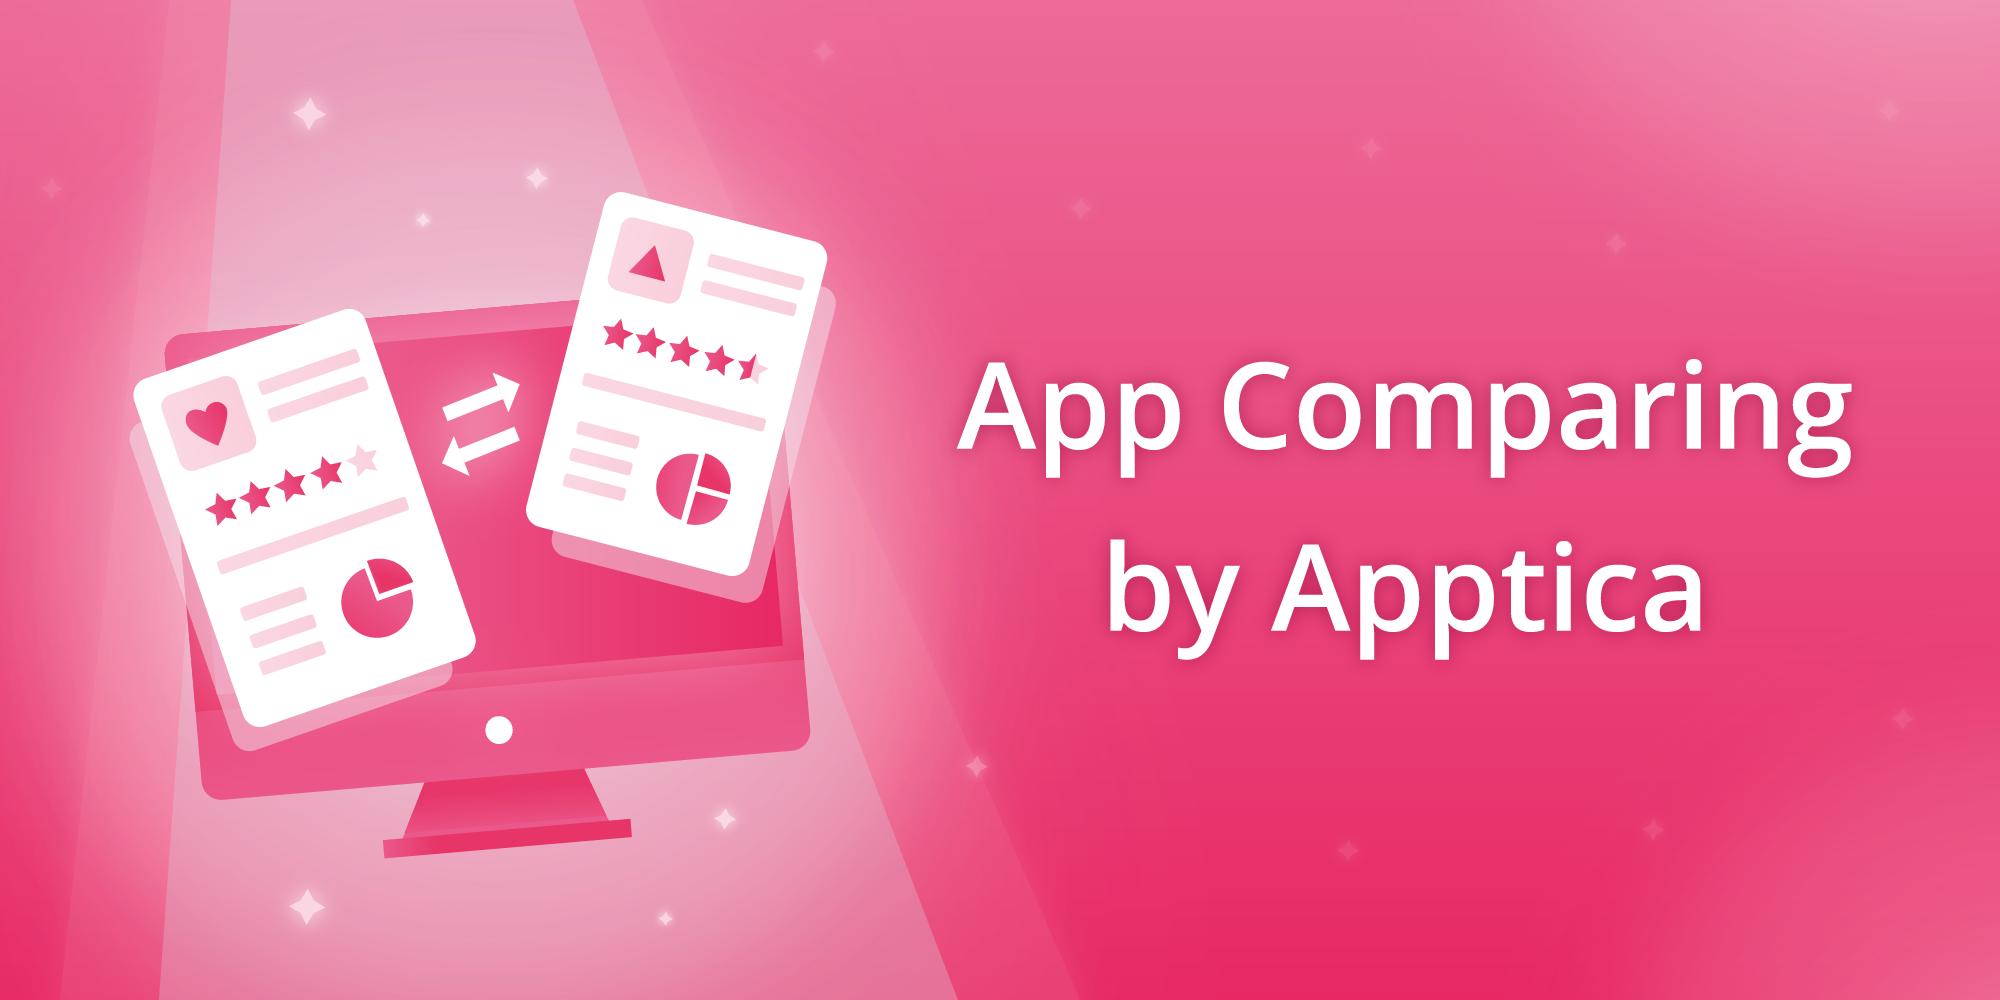 App Comparing by Apptica